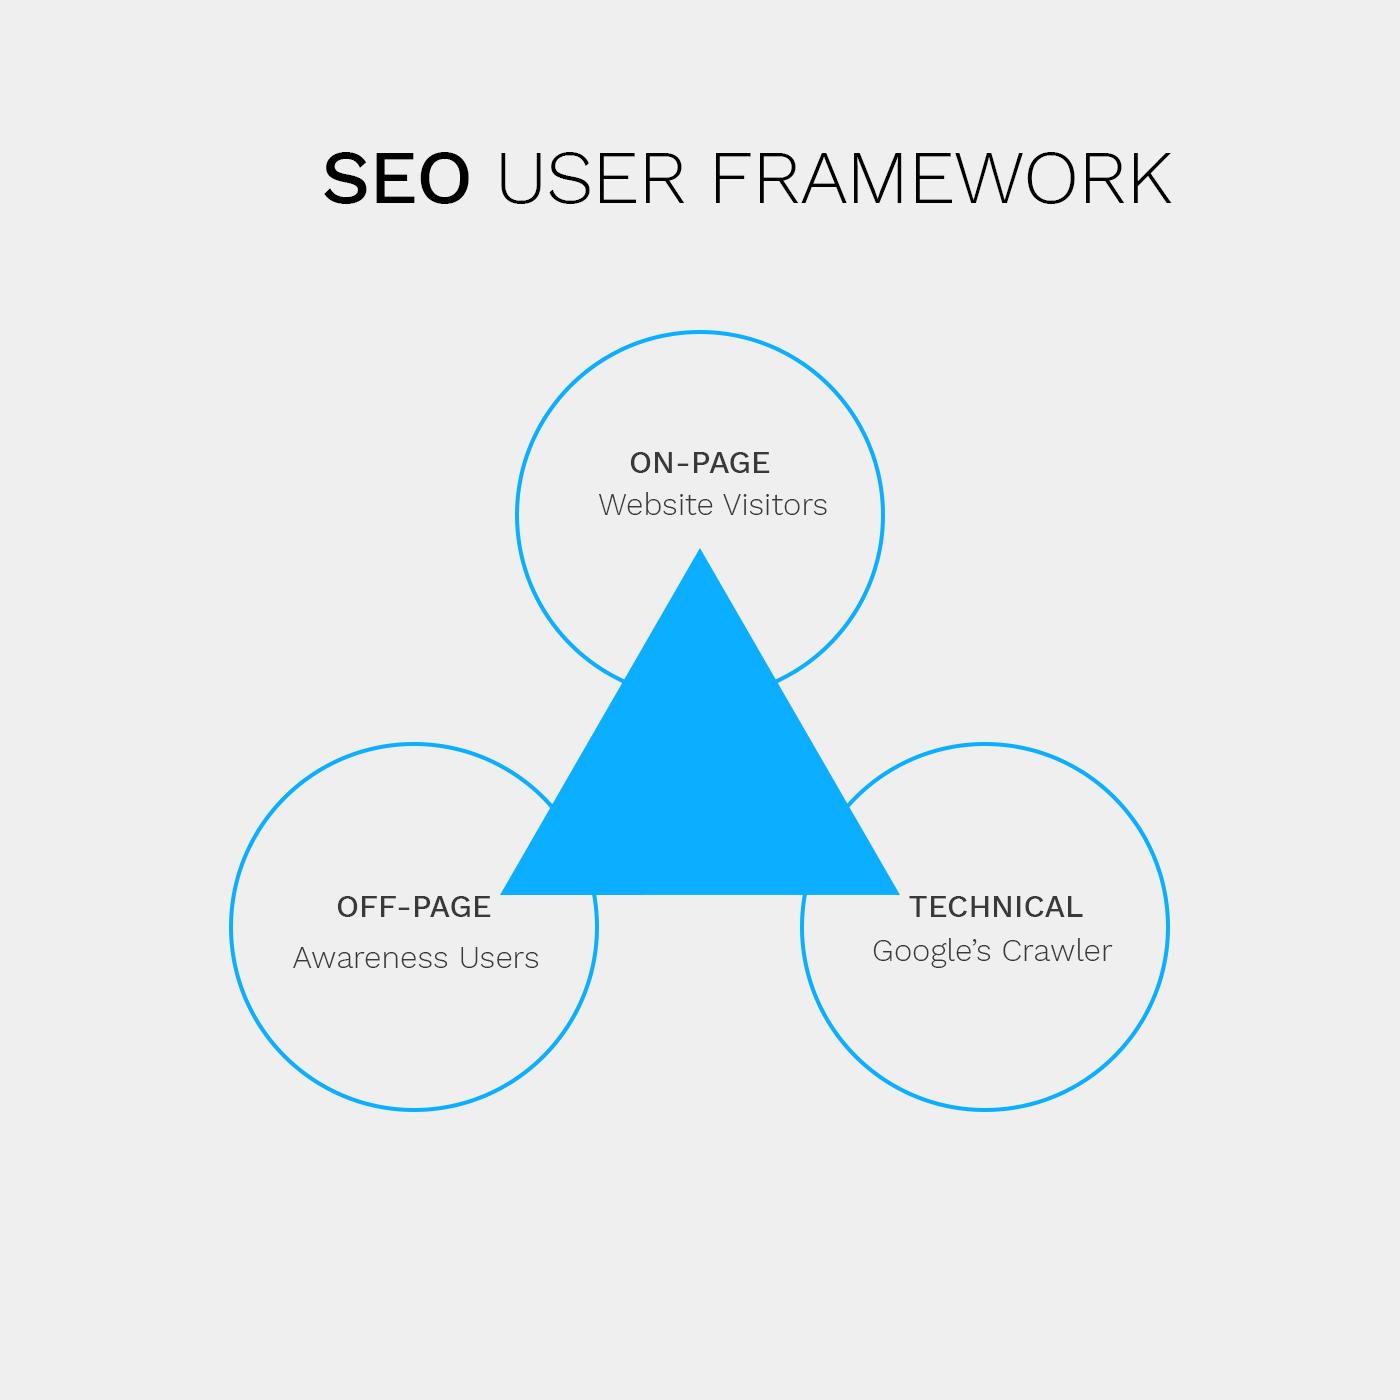 search engine optimization (SEO) user framework